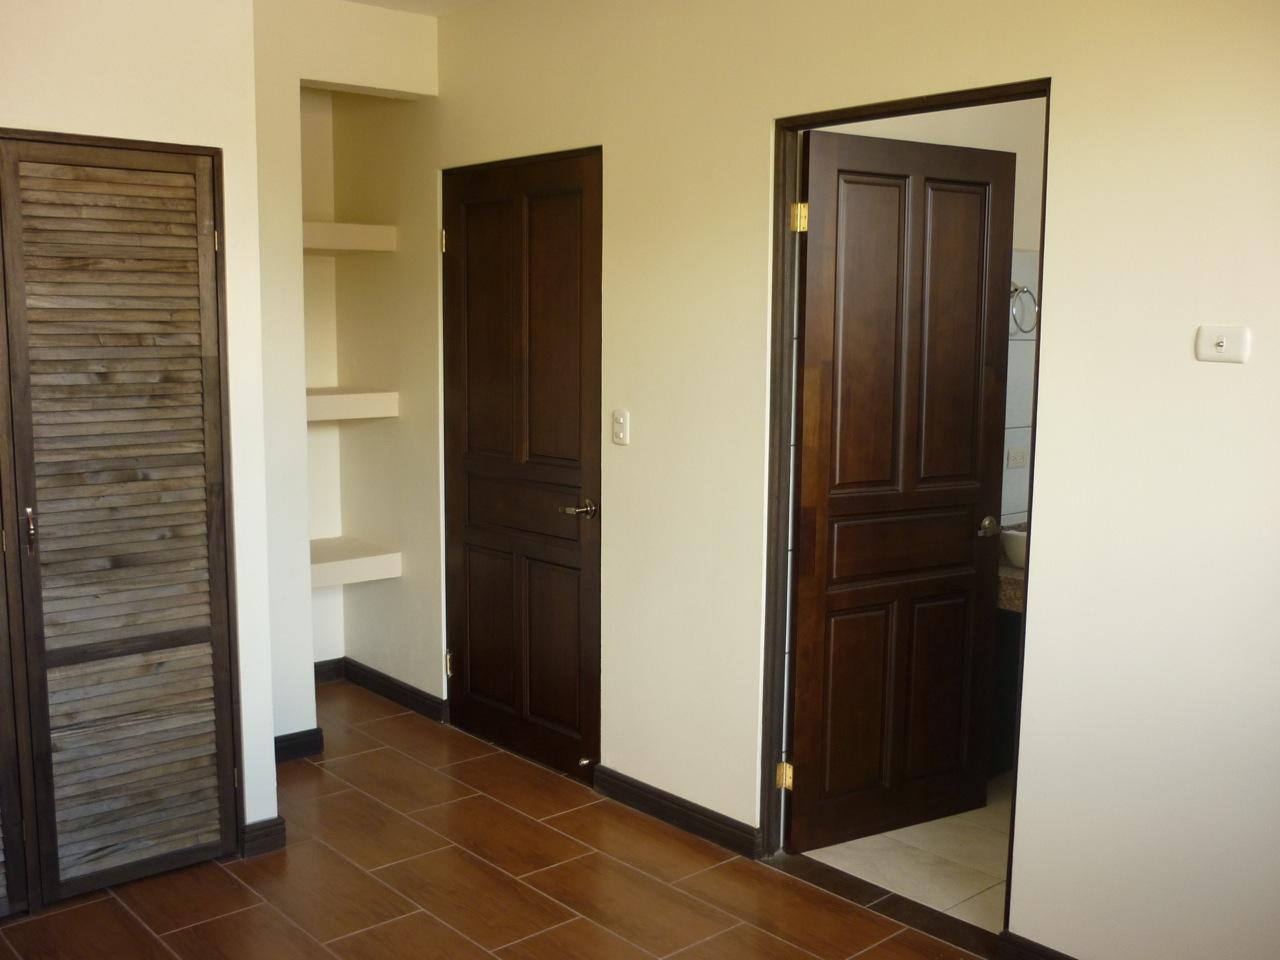 Apartamentos mgc ecoarqsos for Pisos de ceramica para cocina comedor